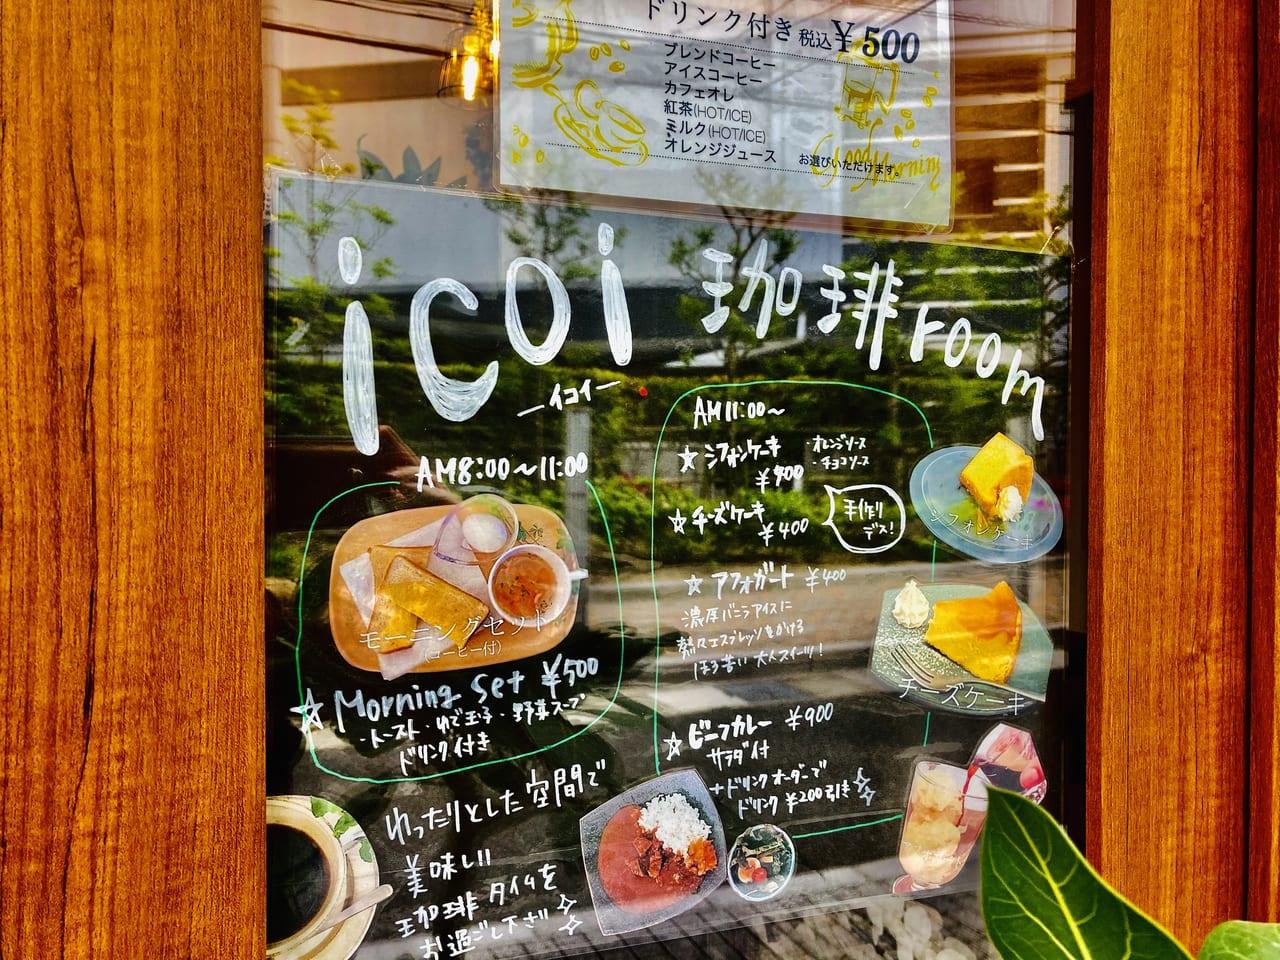 icoi menu1